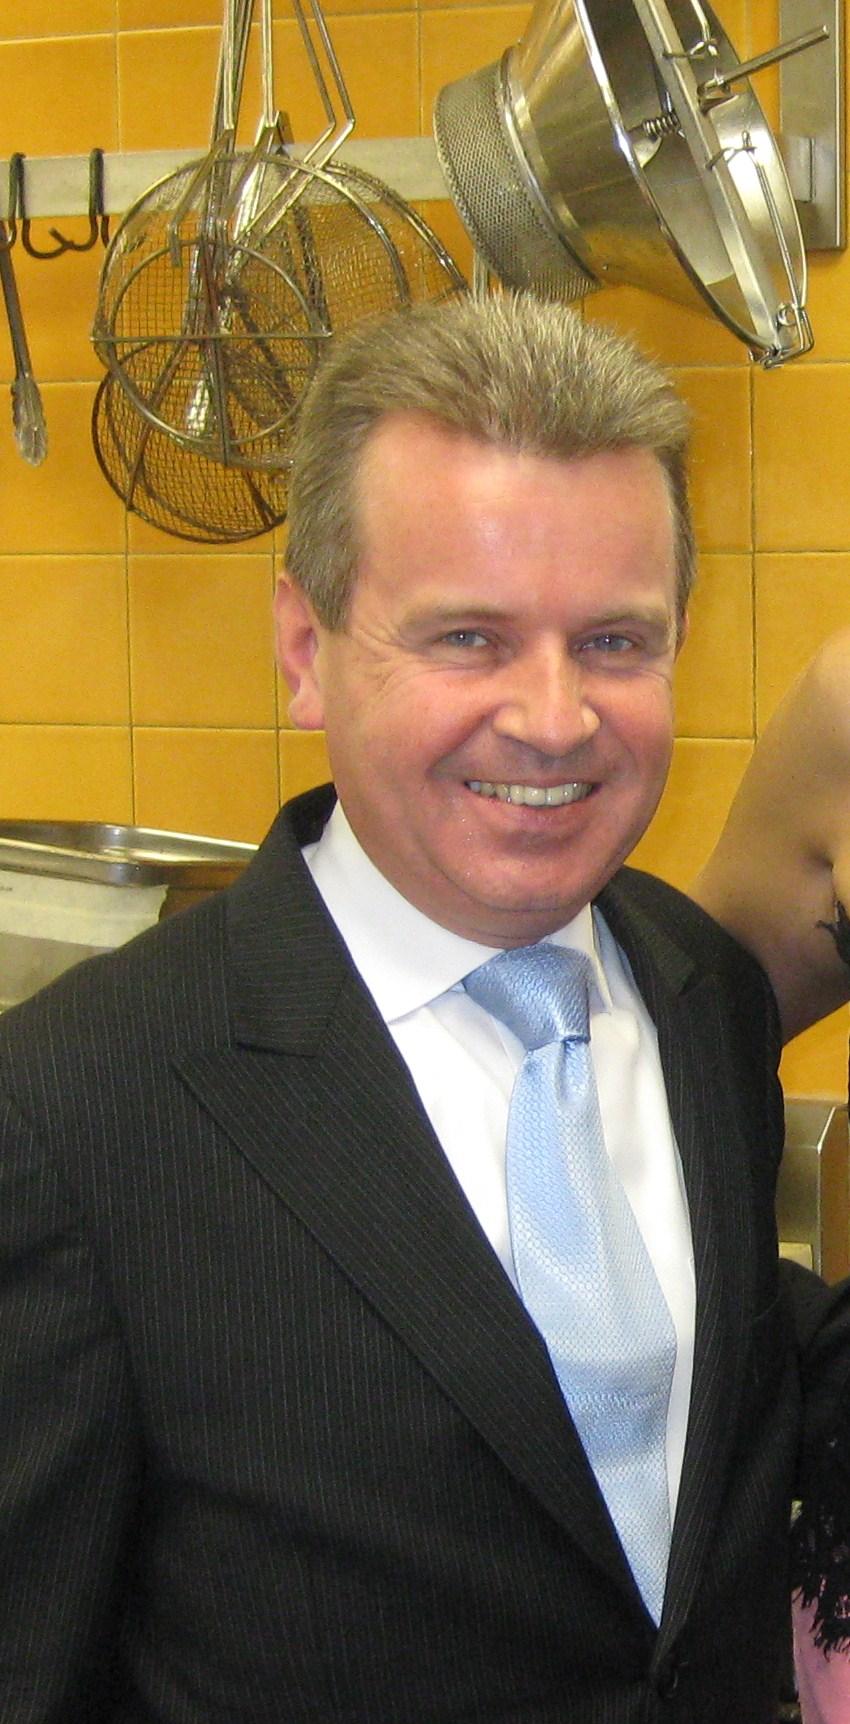 Spago general manager Laurent Steunou